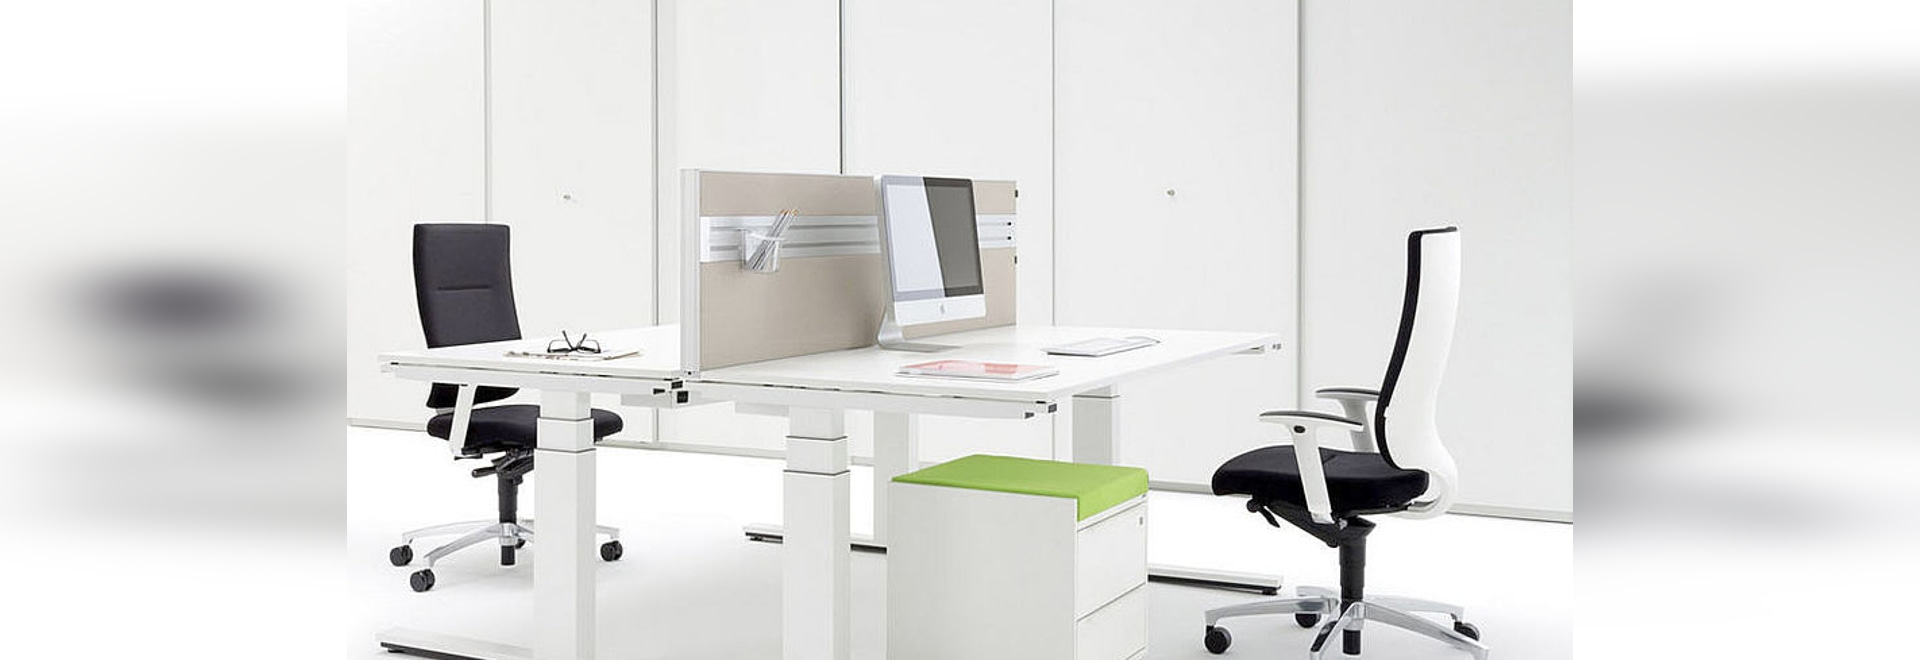 WINEA ECO - WINI Büromöbel Georg Schmidt GmbH & Co. KG